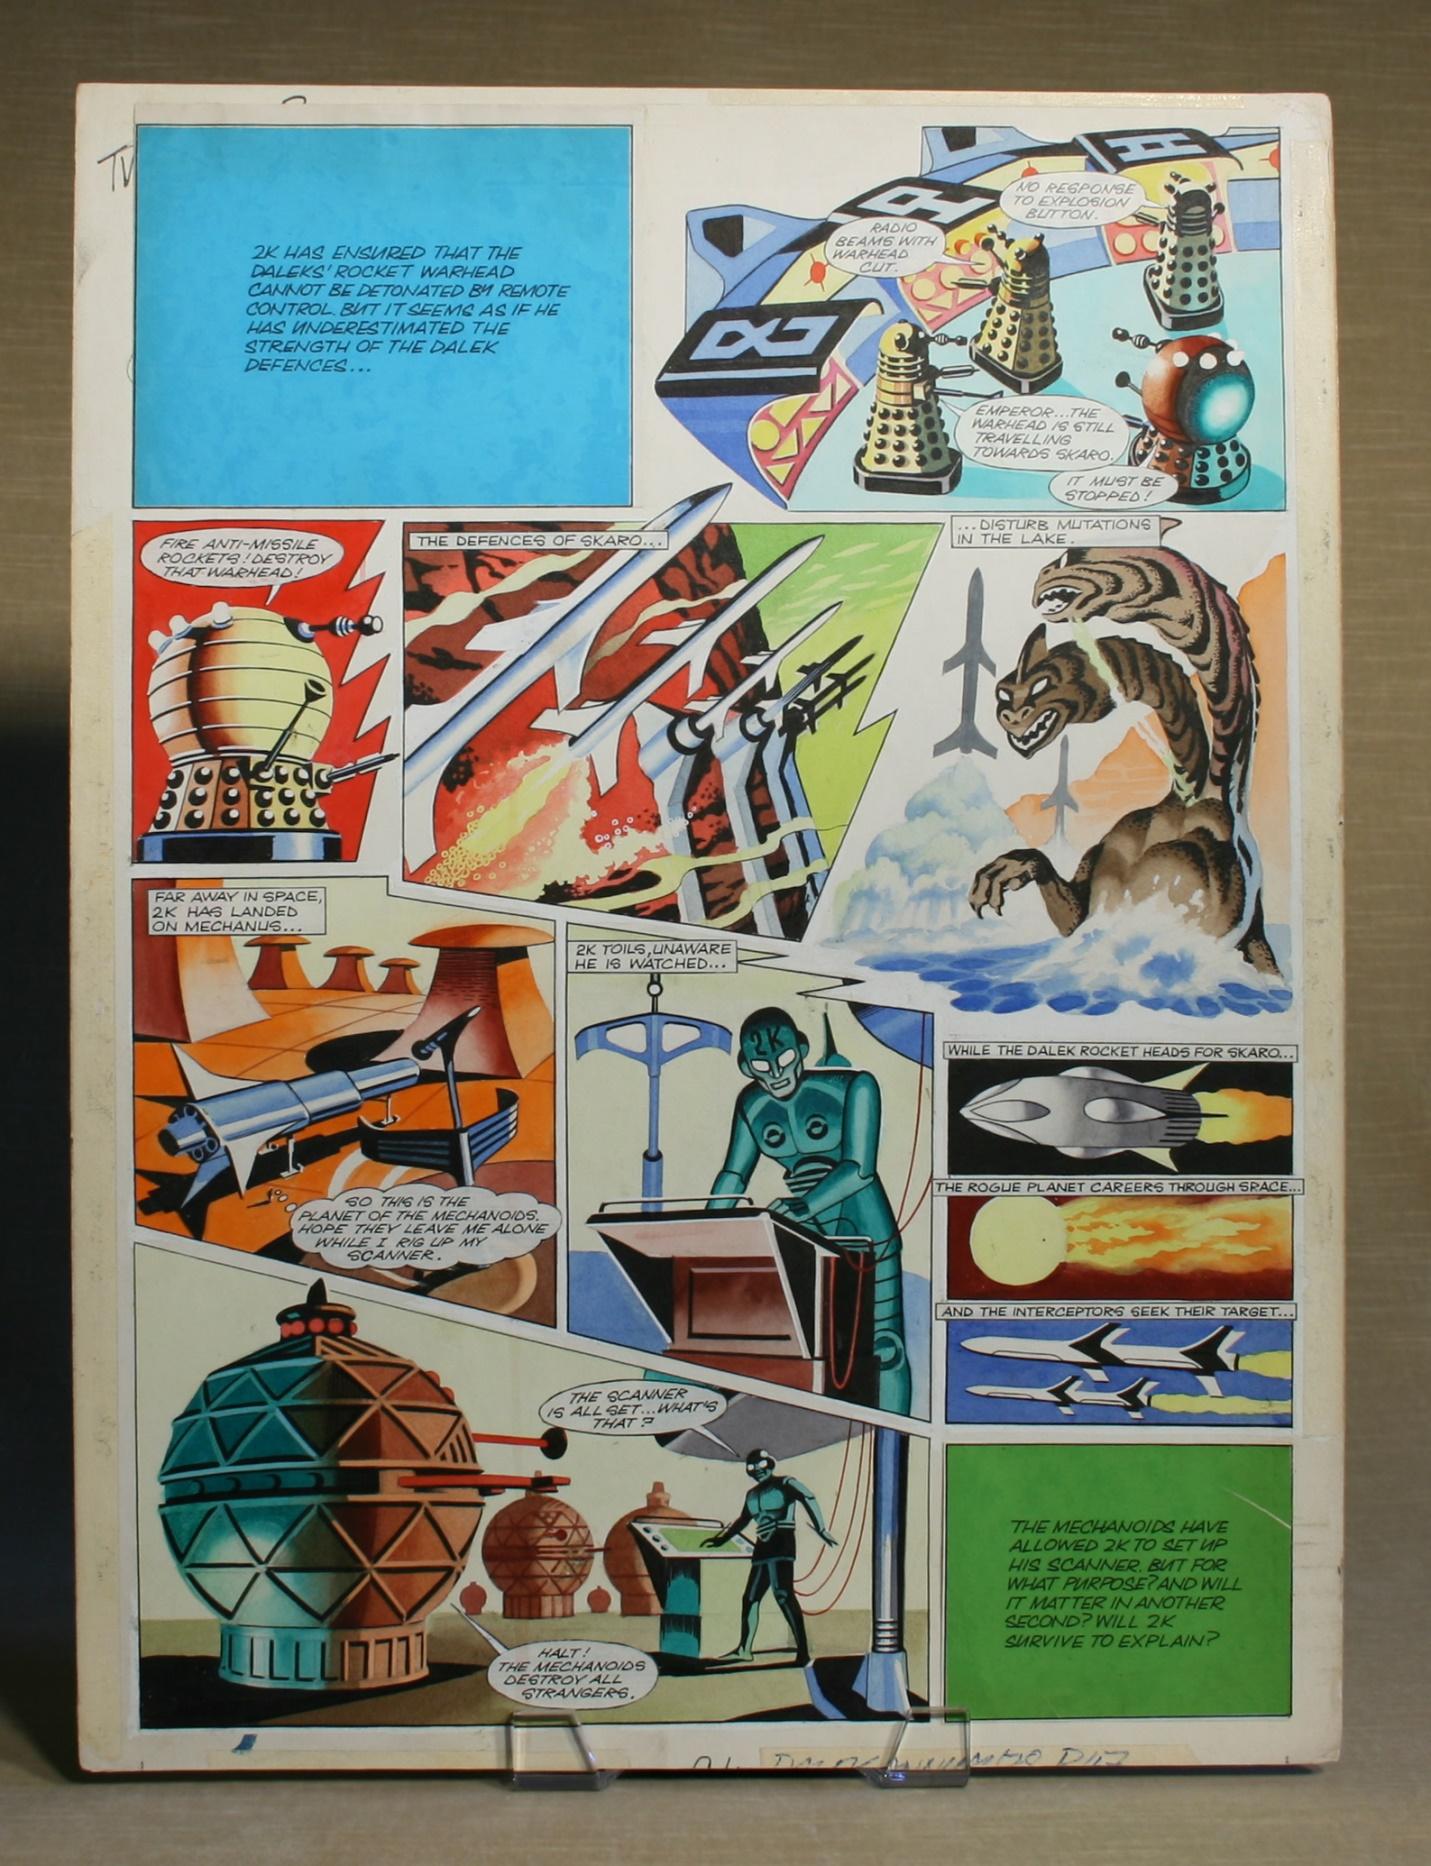 Original artwork for the Dalek strip in TV Century 21, no. 68